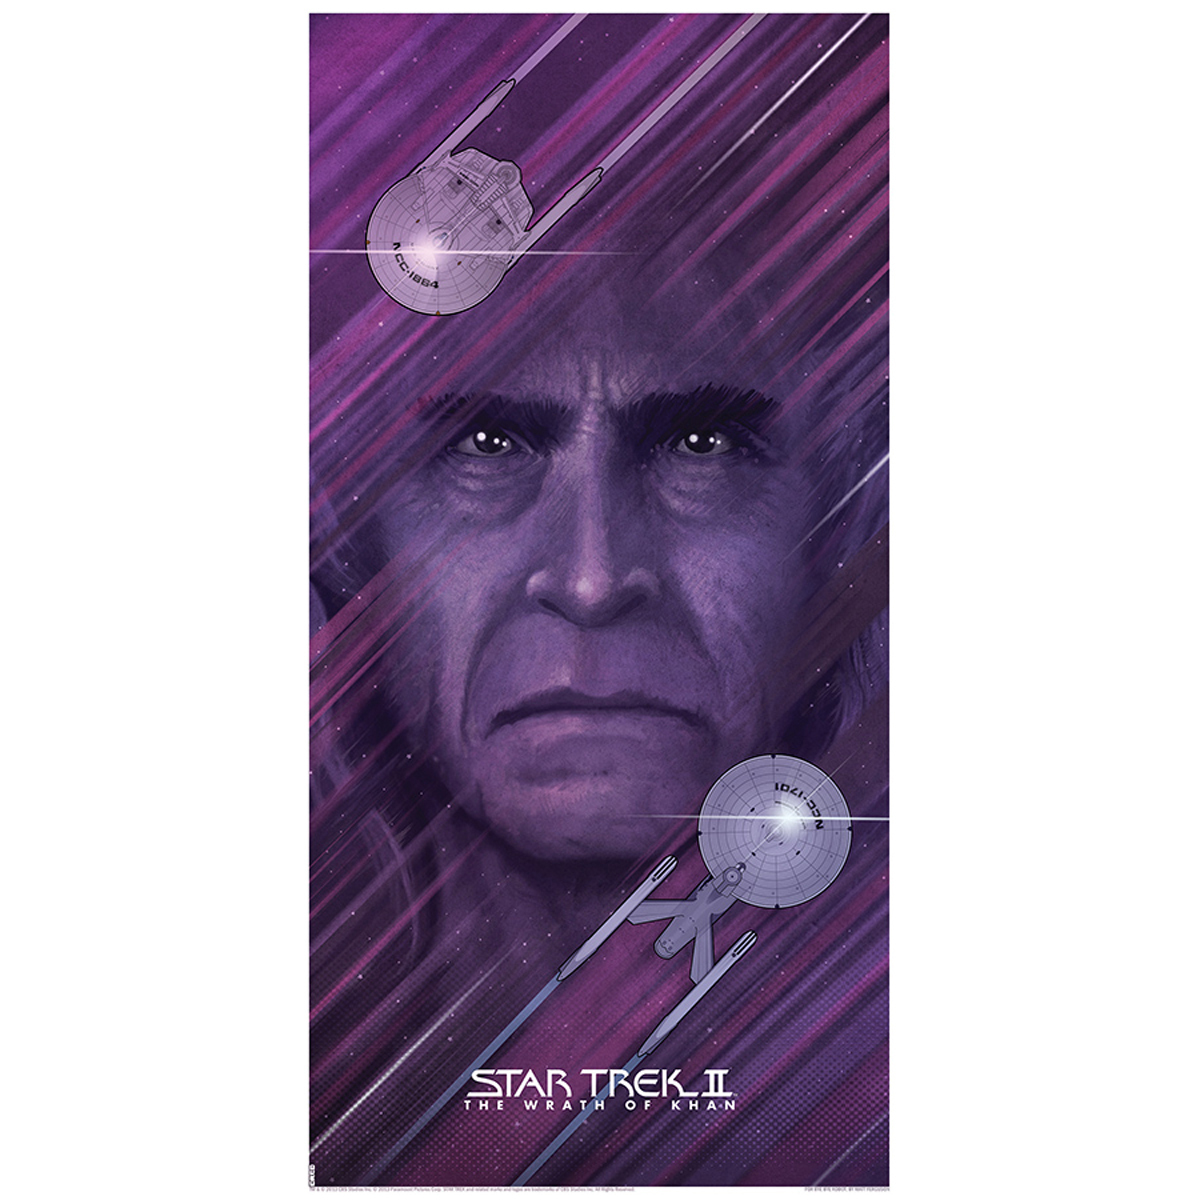 Star Trek II: The Wrath Of Khan Lithograph [12x24]